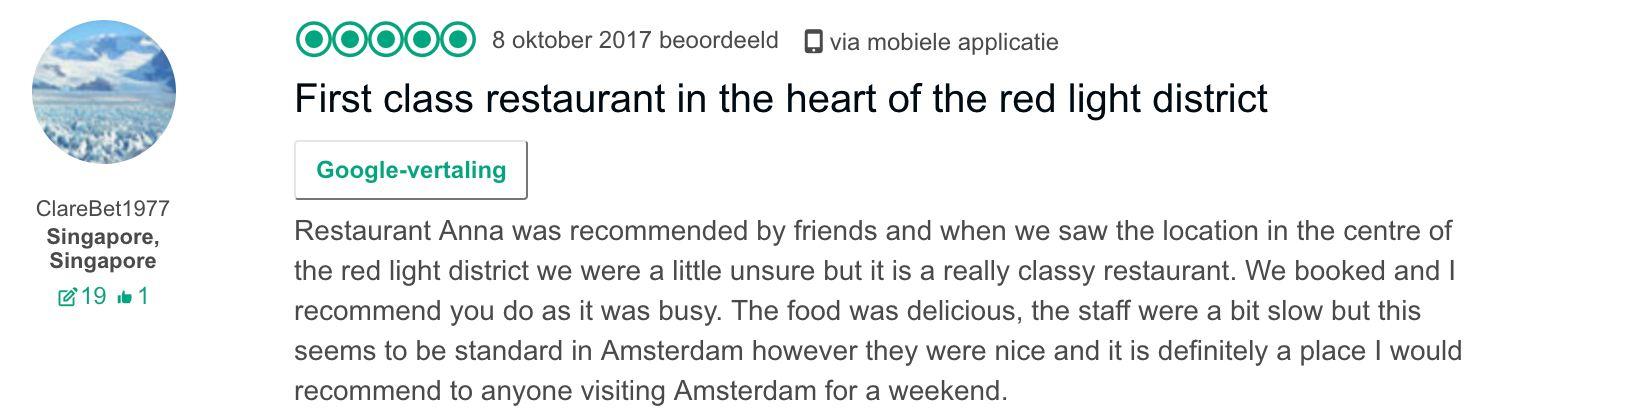 Restaurant Anna Tripadvisor Review